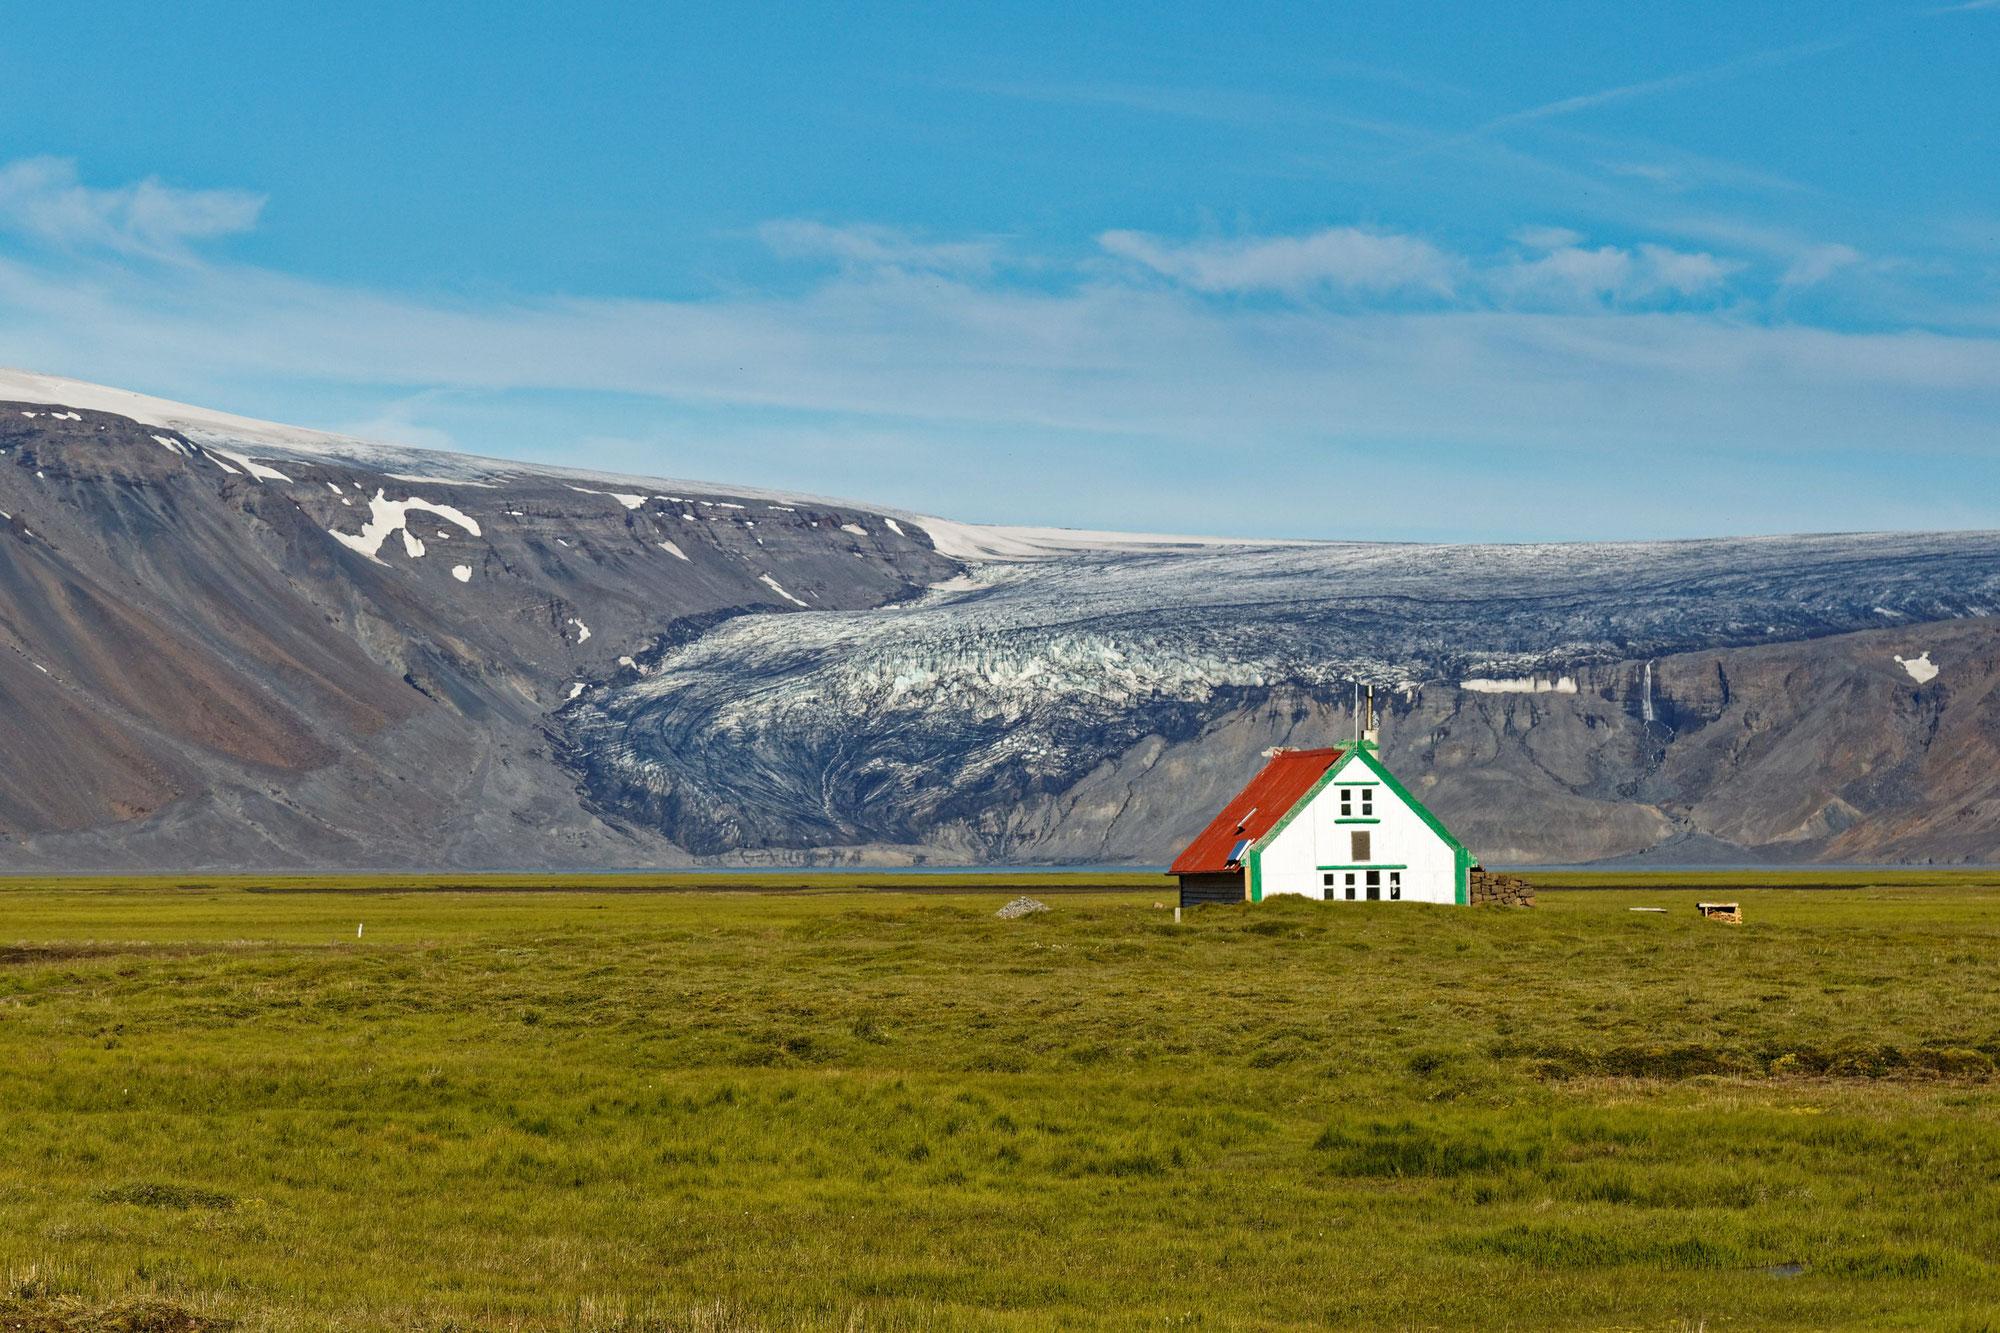 Island - wir wandern durch das Hochland